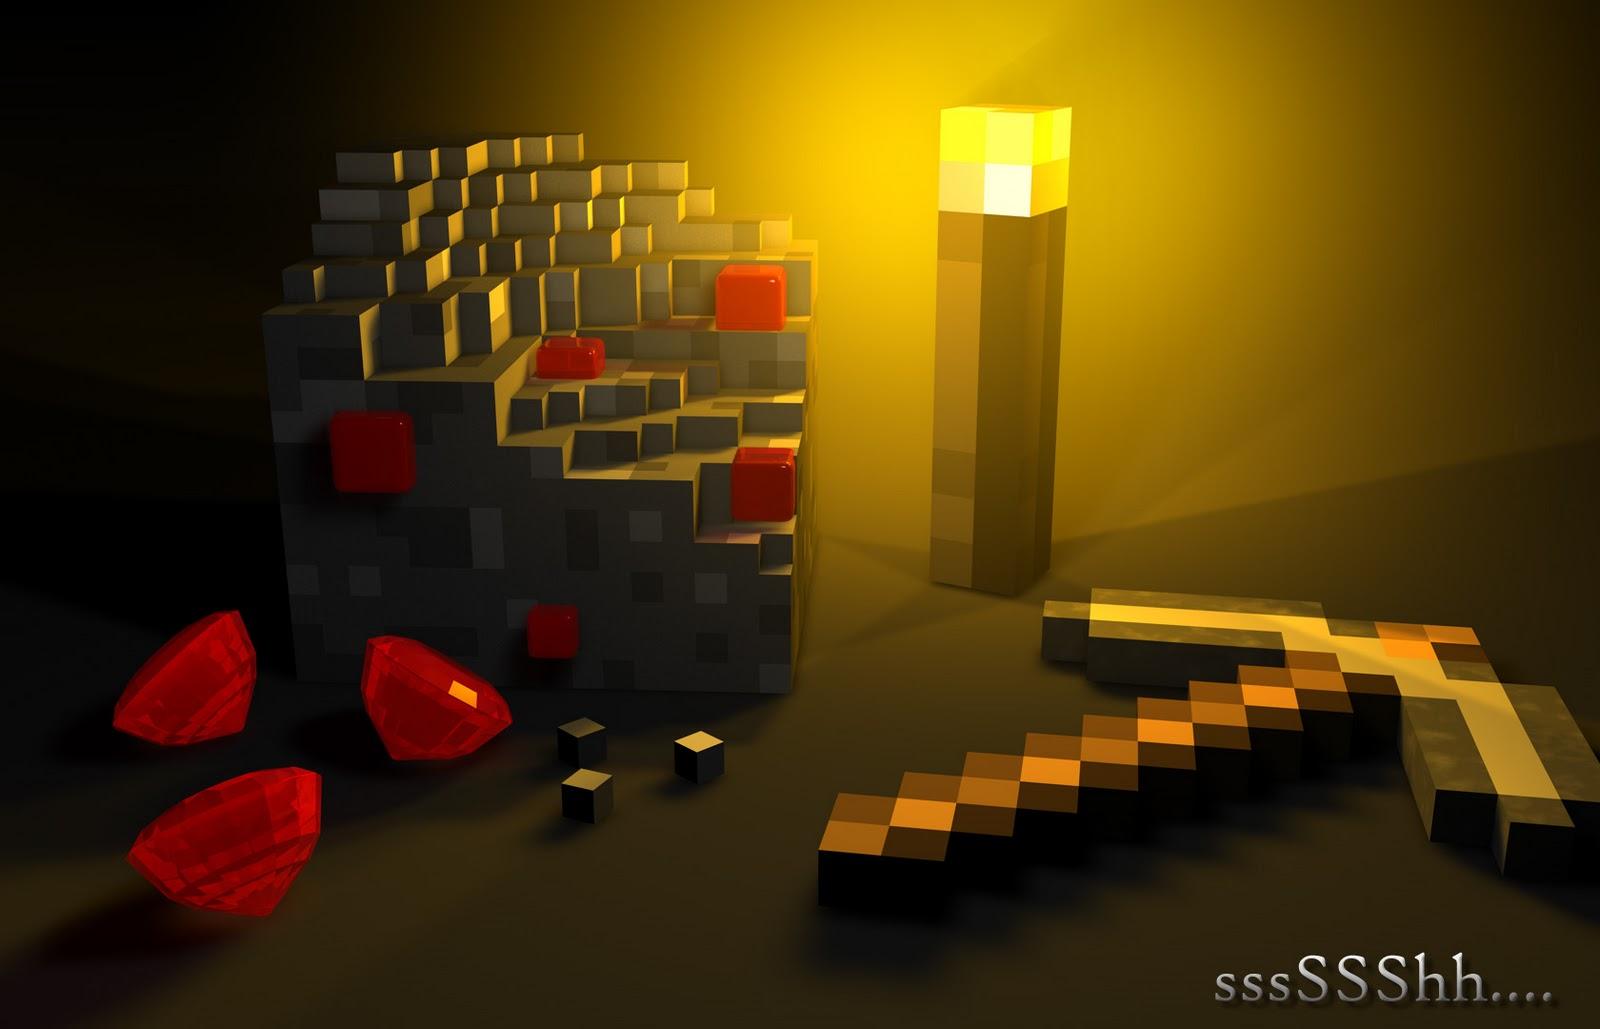 http://1.bp.blogspot.com/--DUYUUwGJRY/TqsIURIM6gI/AAAAAAAAAfQ/HS3M61V-0NU/s1600/Minecraft+Wallpaper+HD+1680x1080.jpg